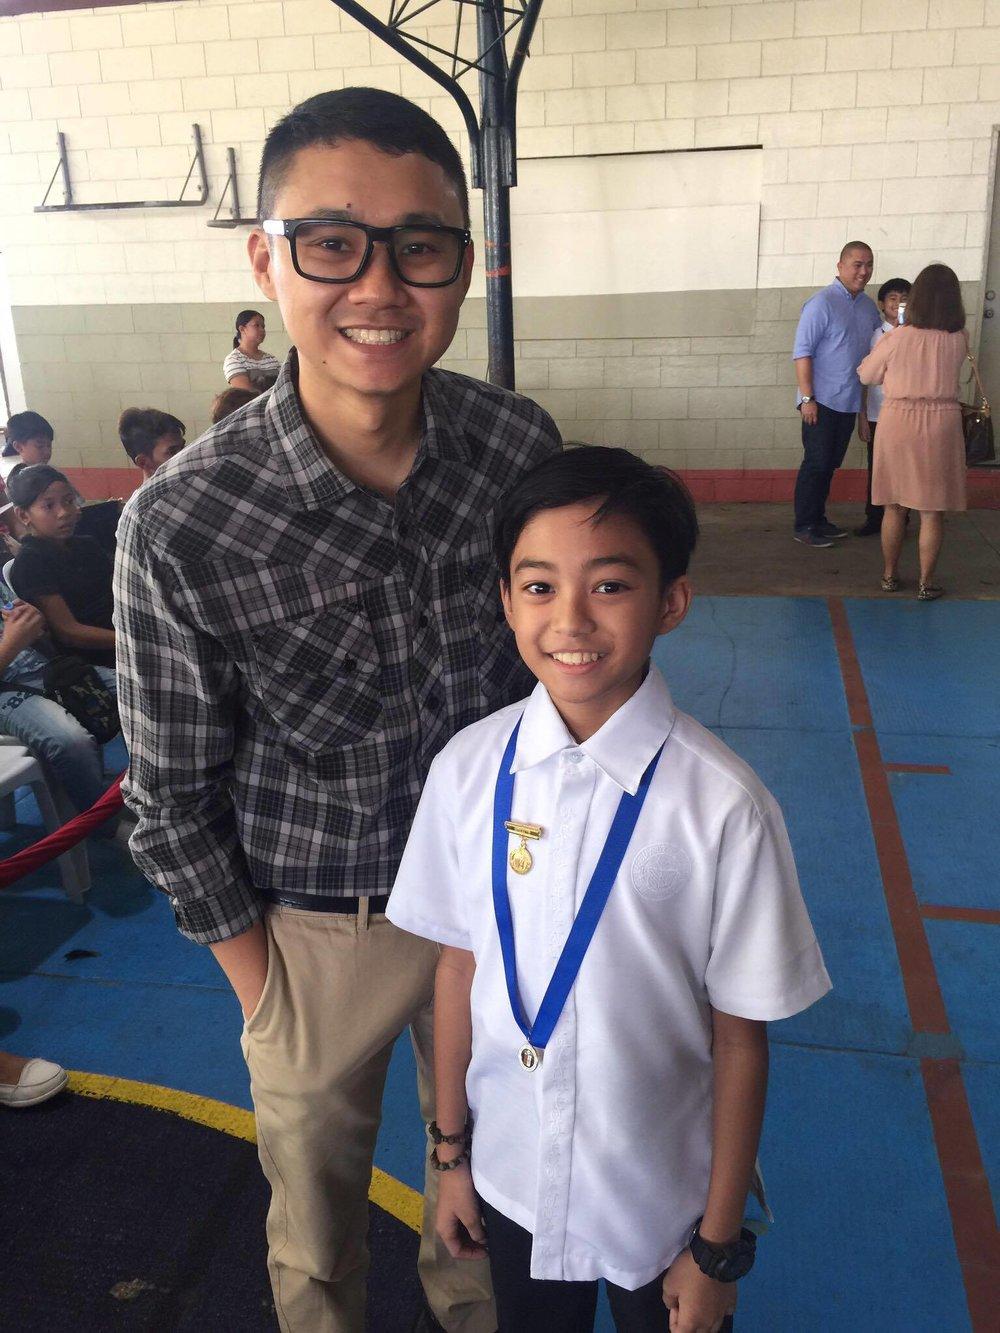 Mio and his Dad, Roman during his Grade School graduation in March 2016